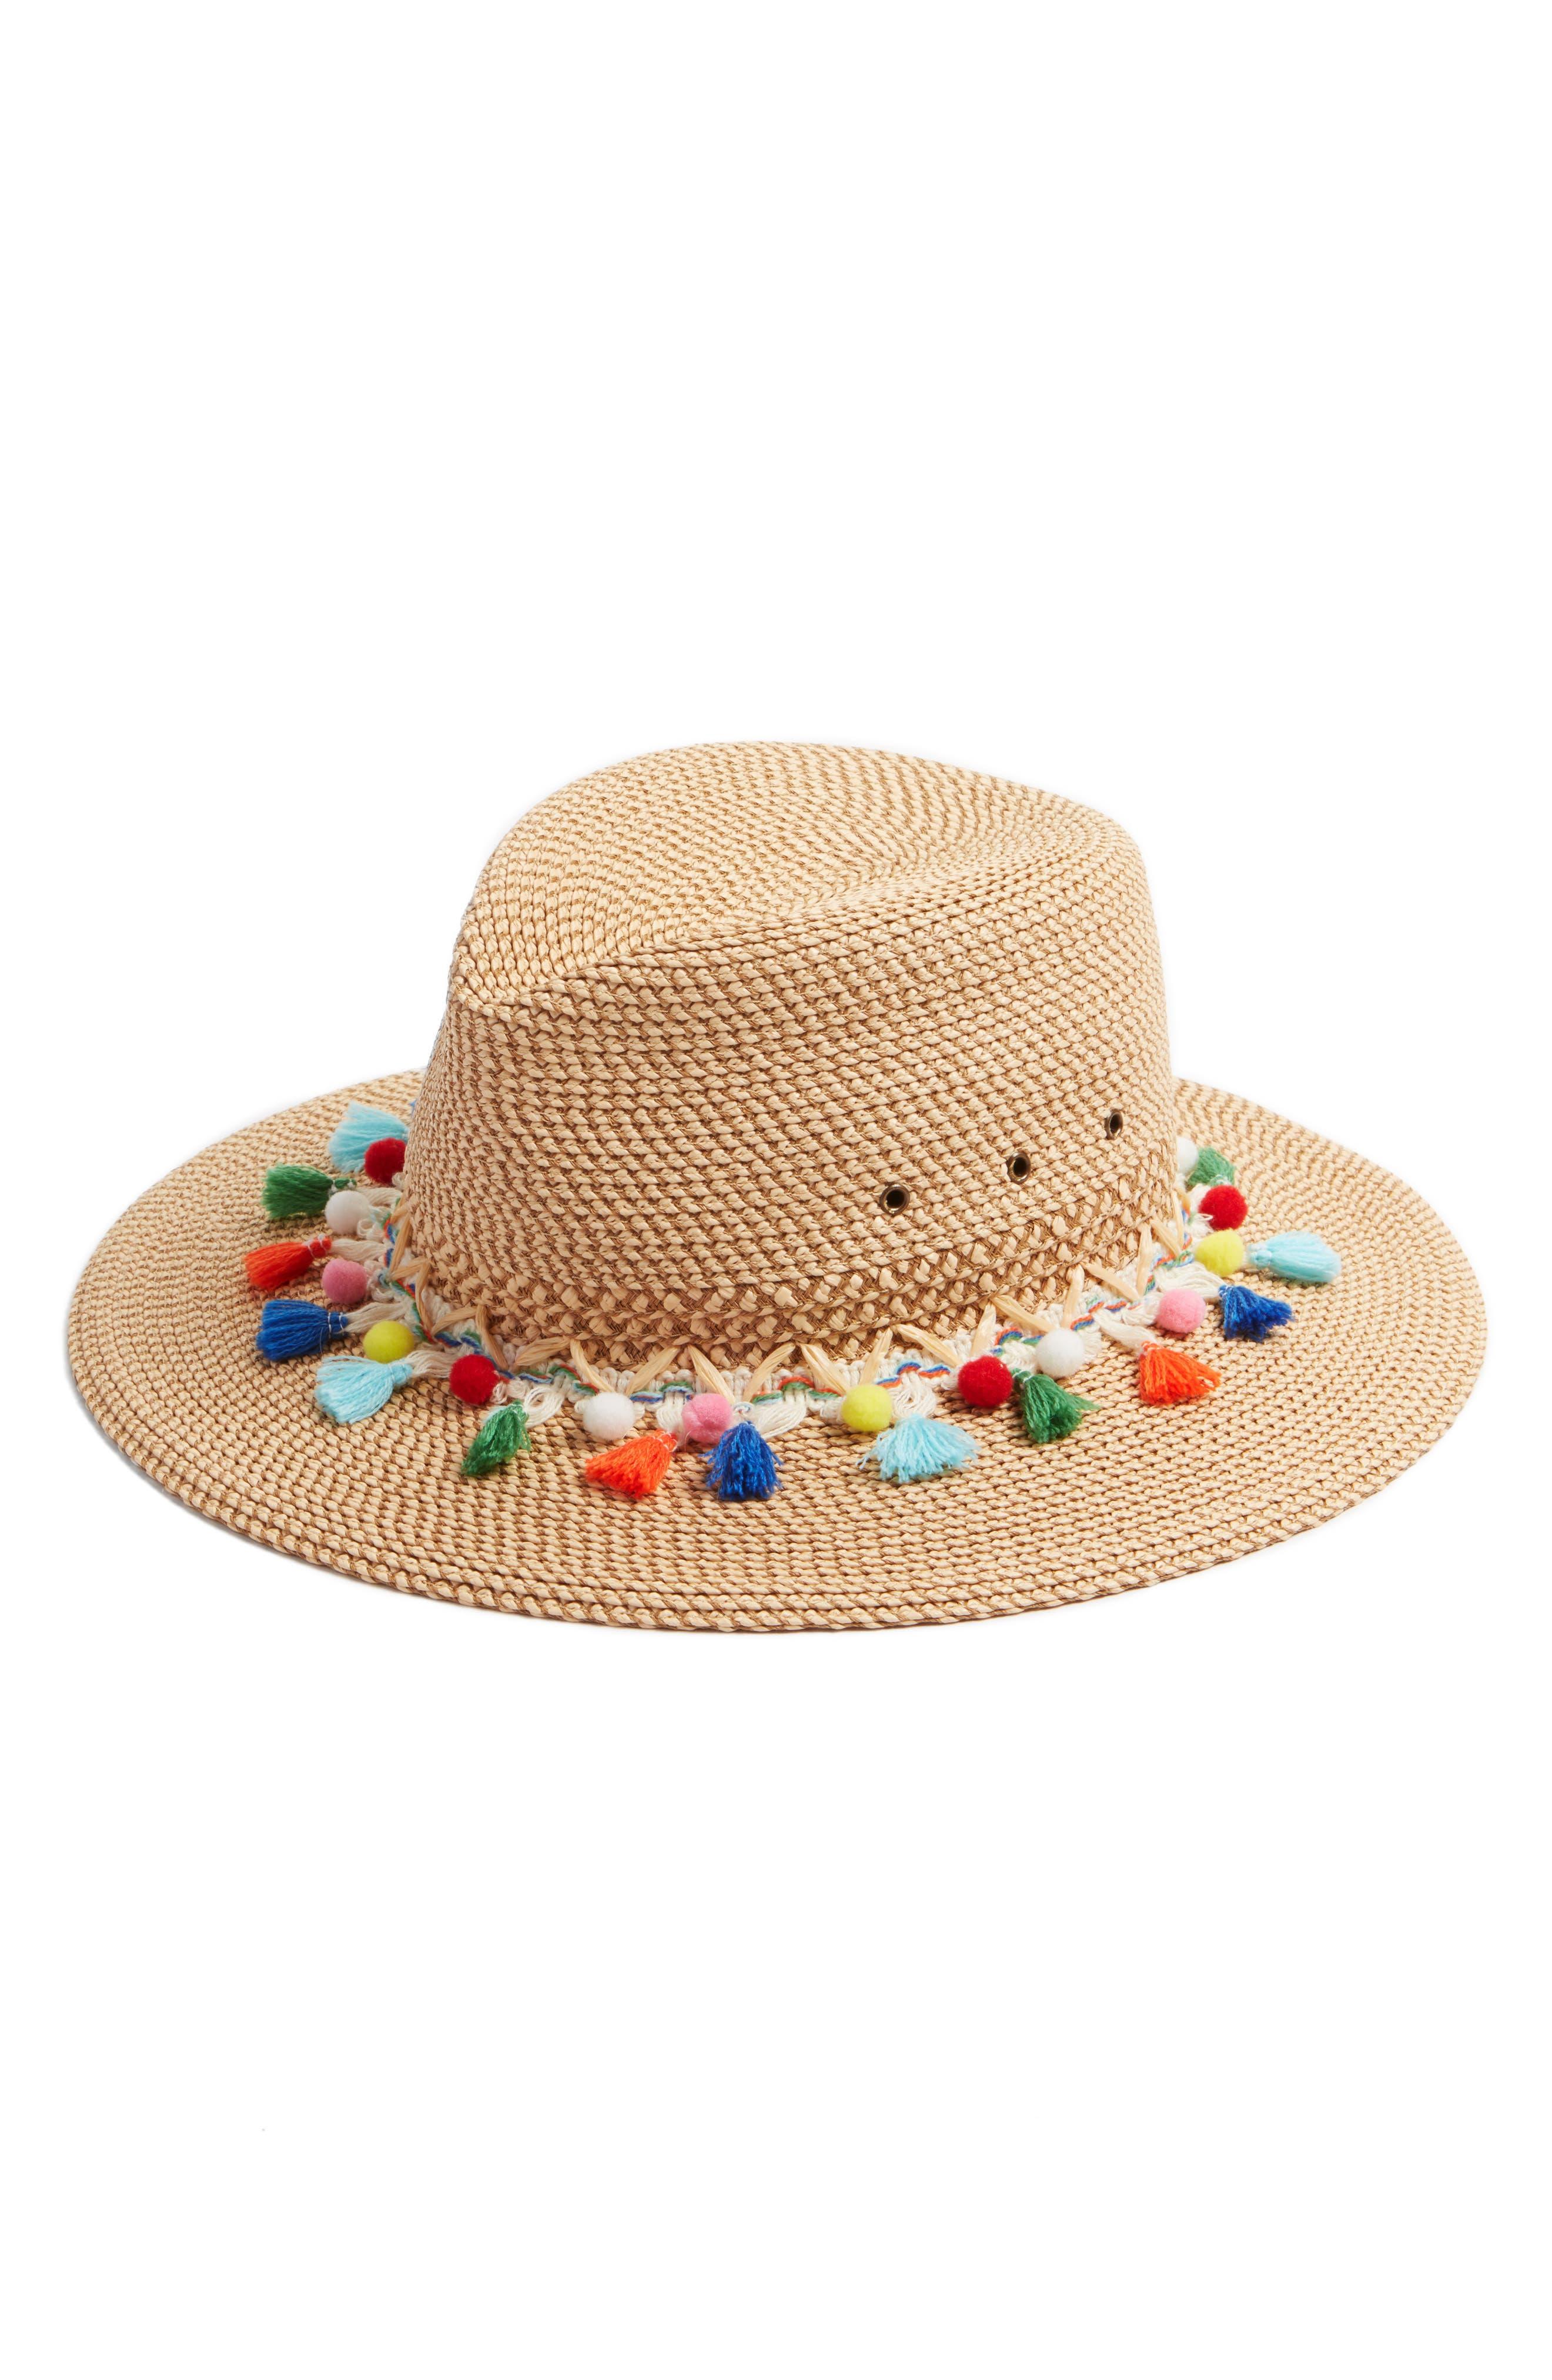 Bahia Sun Hat,                             Main thumbnail 1, color,                             Peanut Mix